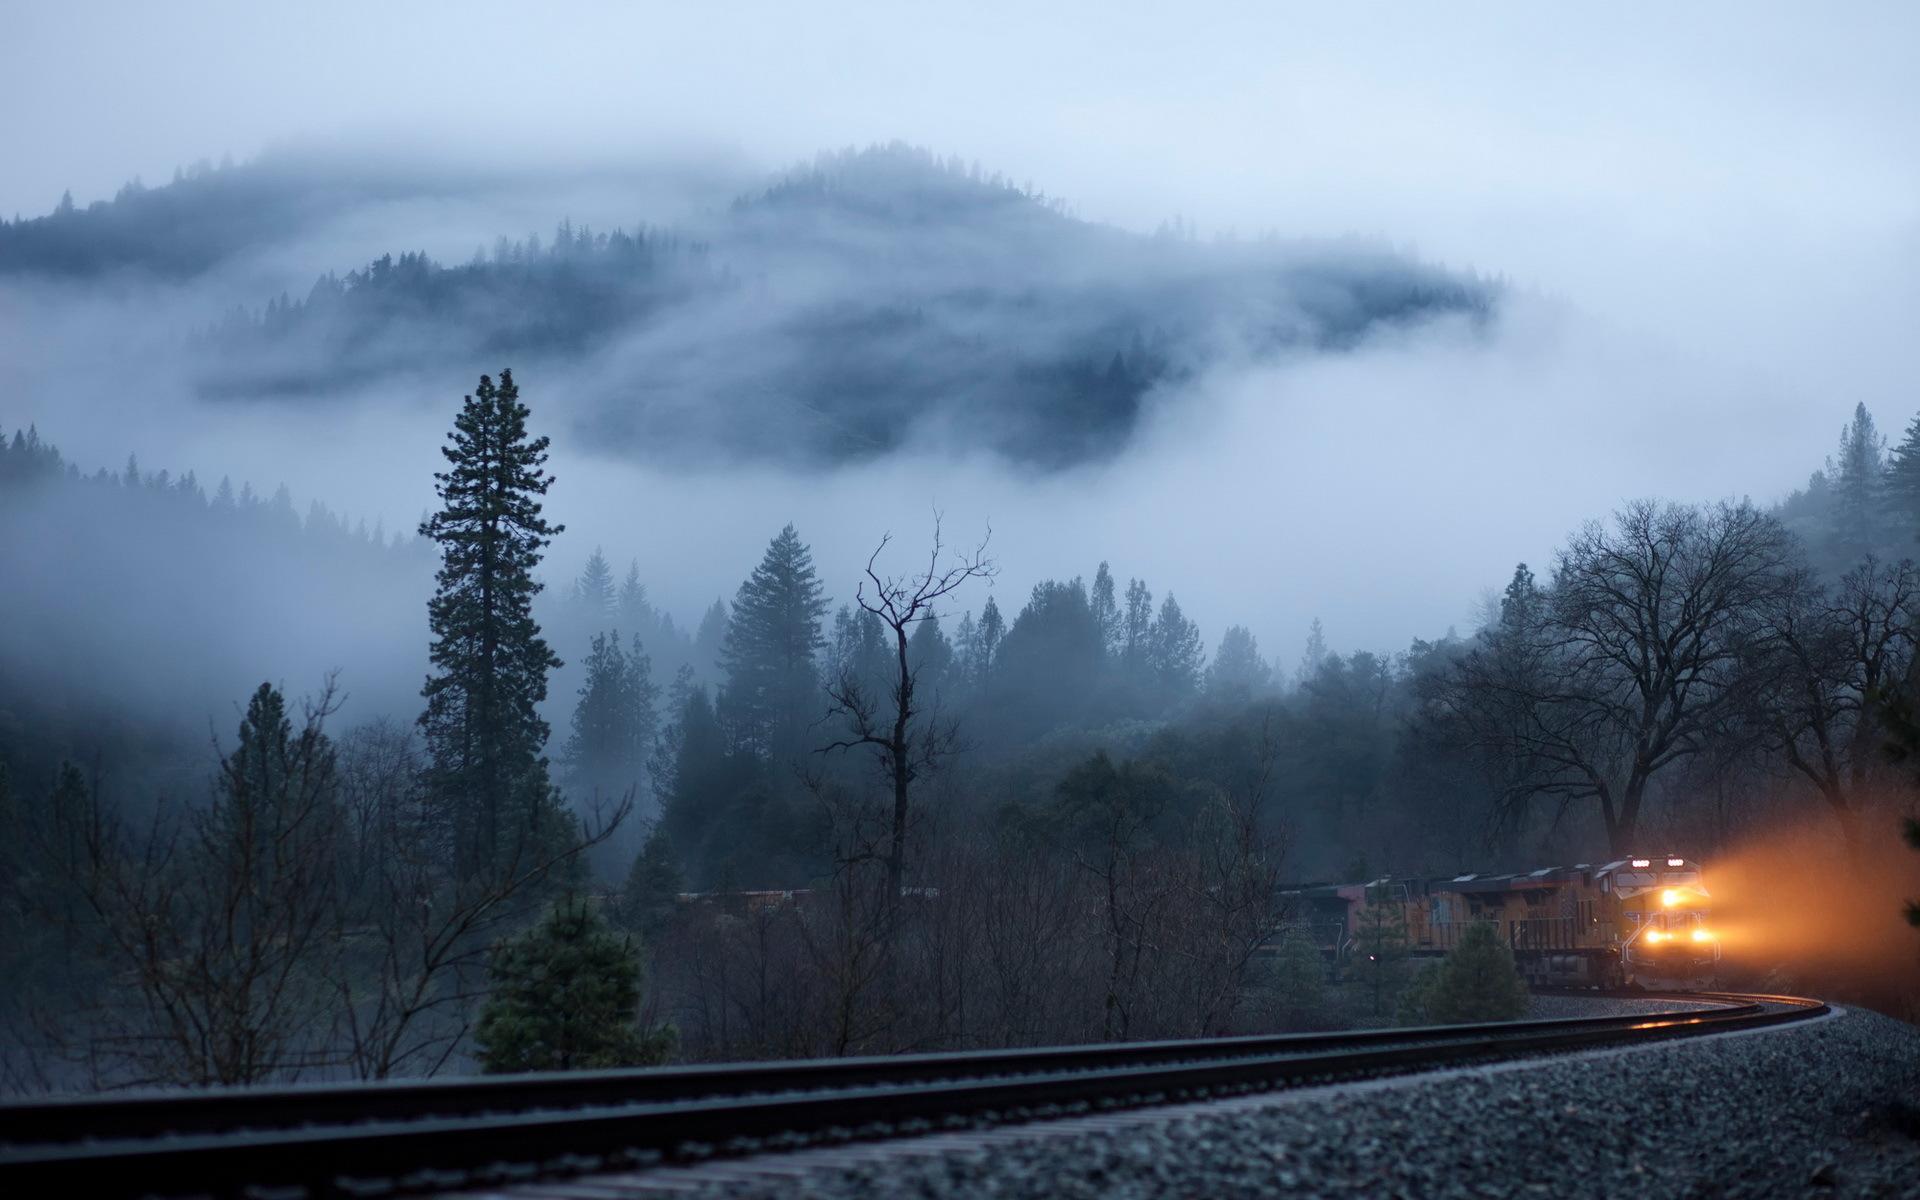 Oregon Football Wallpaper Hd Train Coming From The Foggy Forest Hd Desktop Wallpaper